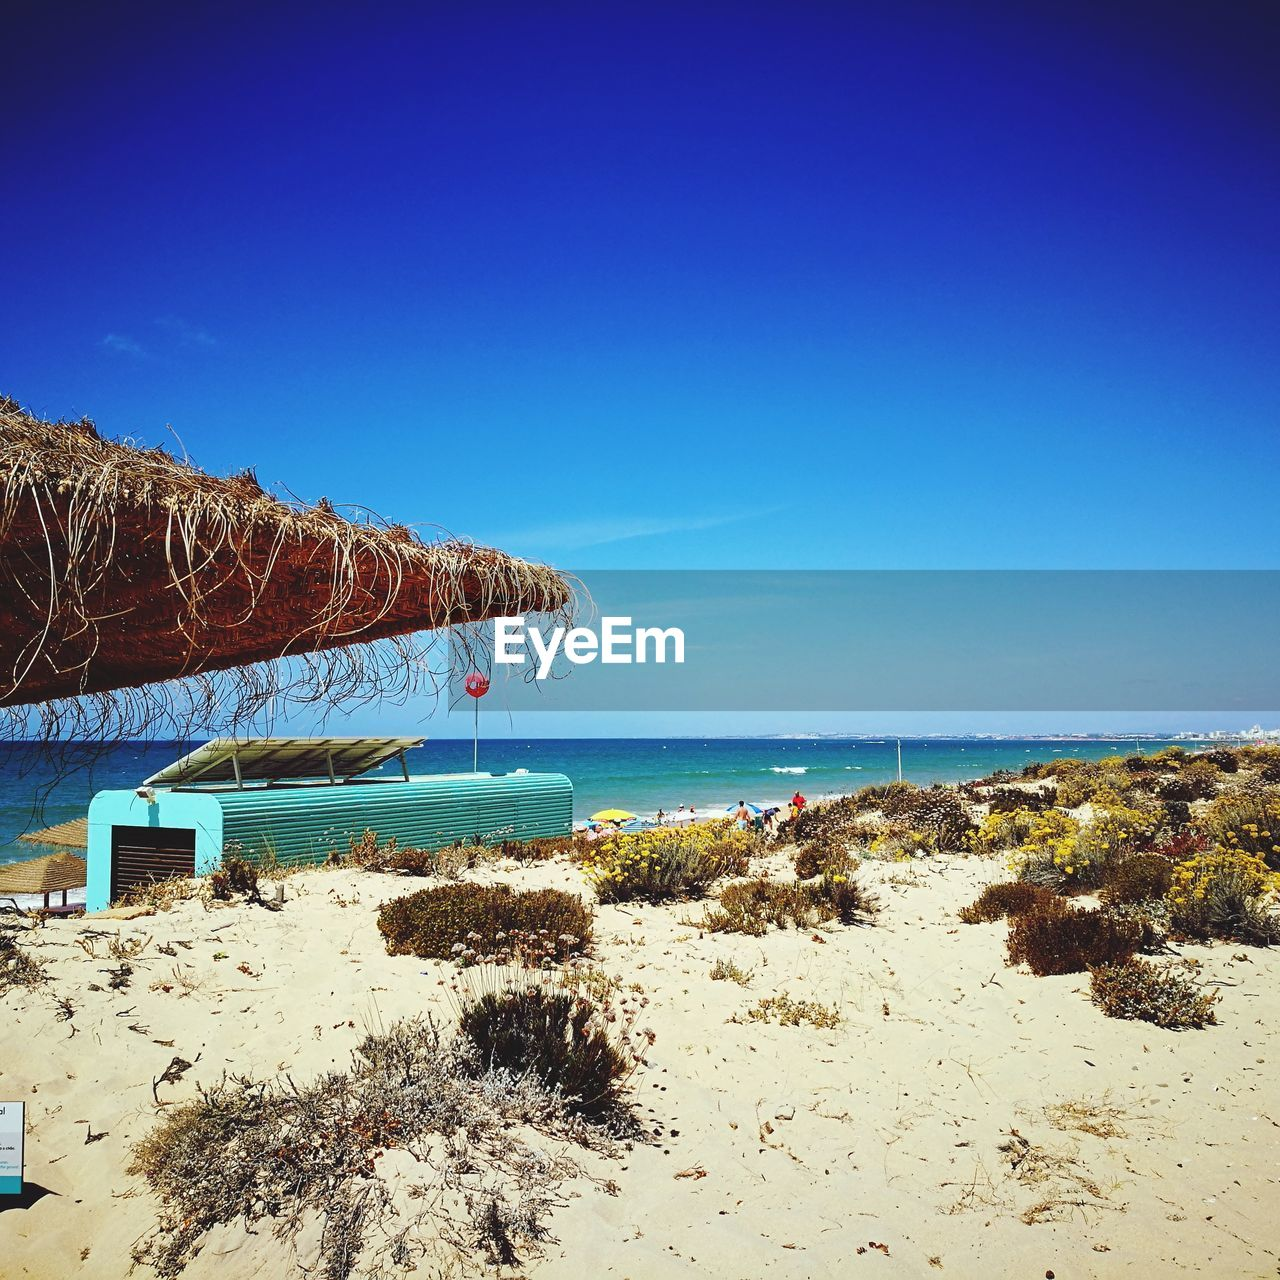 sea, water, sky, blue, beach, land, beauty in nature, scenics - nature, tranquil scene, horizon over water, clear sky, tranquility, nature, day, horizon, copy space, no people, non-urban scene, idyllic, outdoors